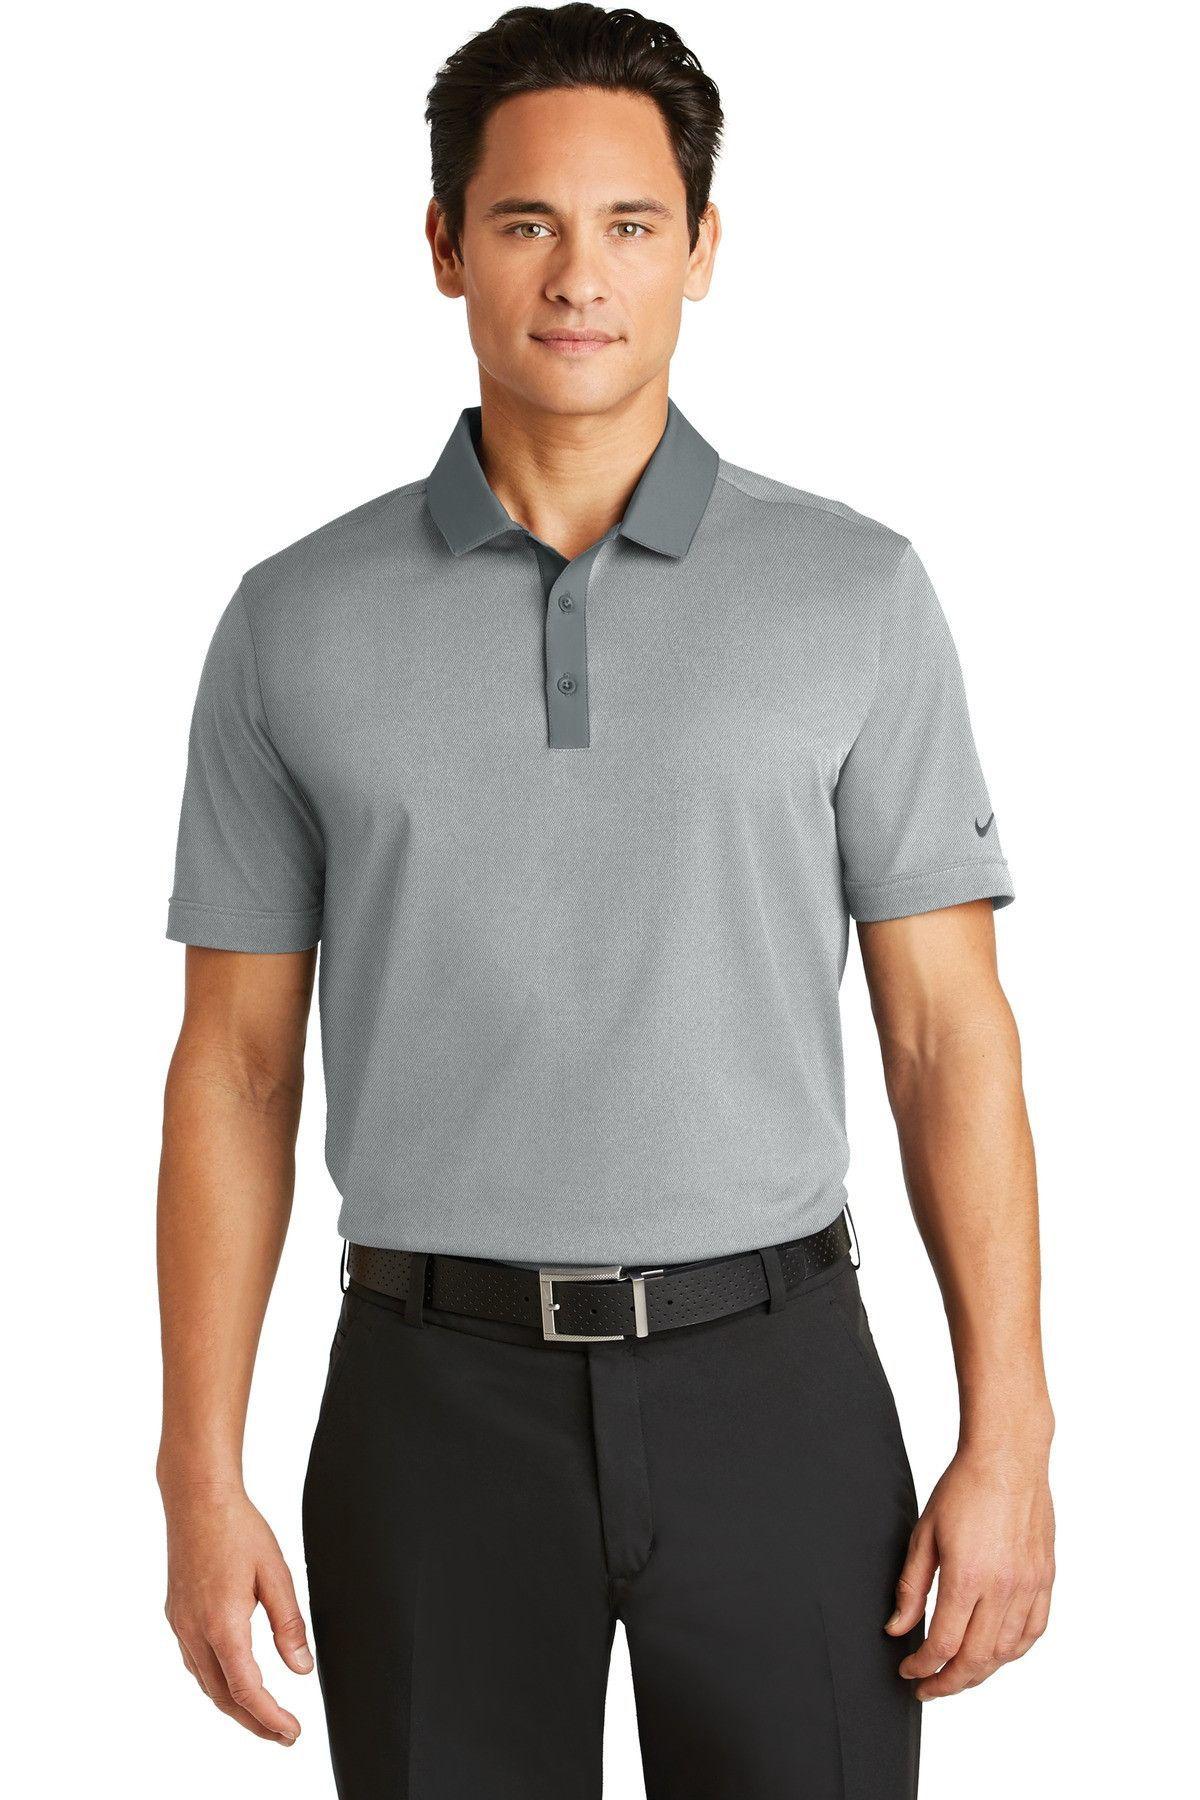 Nike Golf Dri Fit Heather Pique Modern Fit Polo Grey Heather 779798